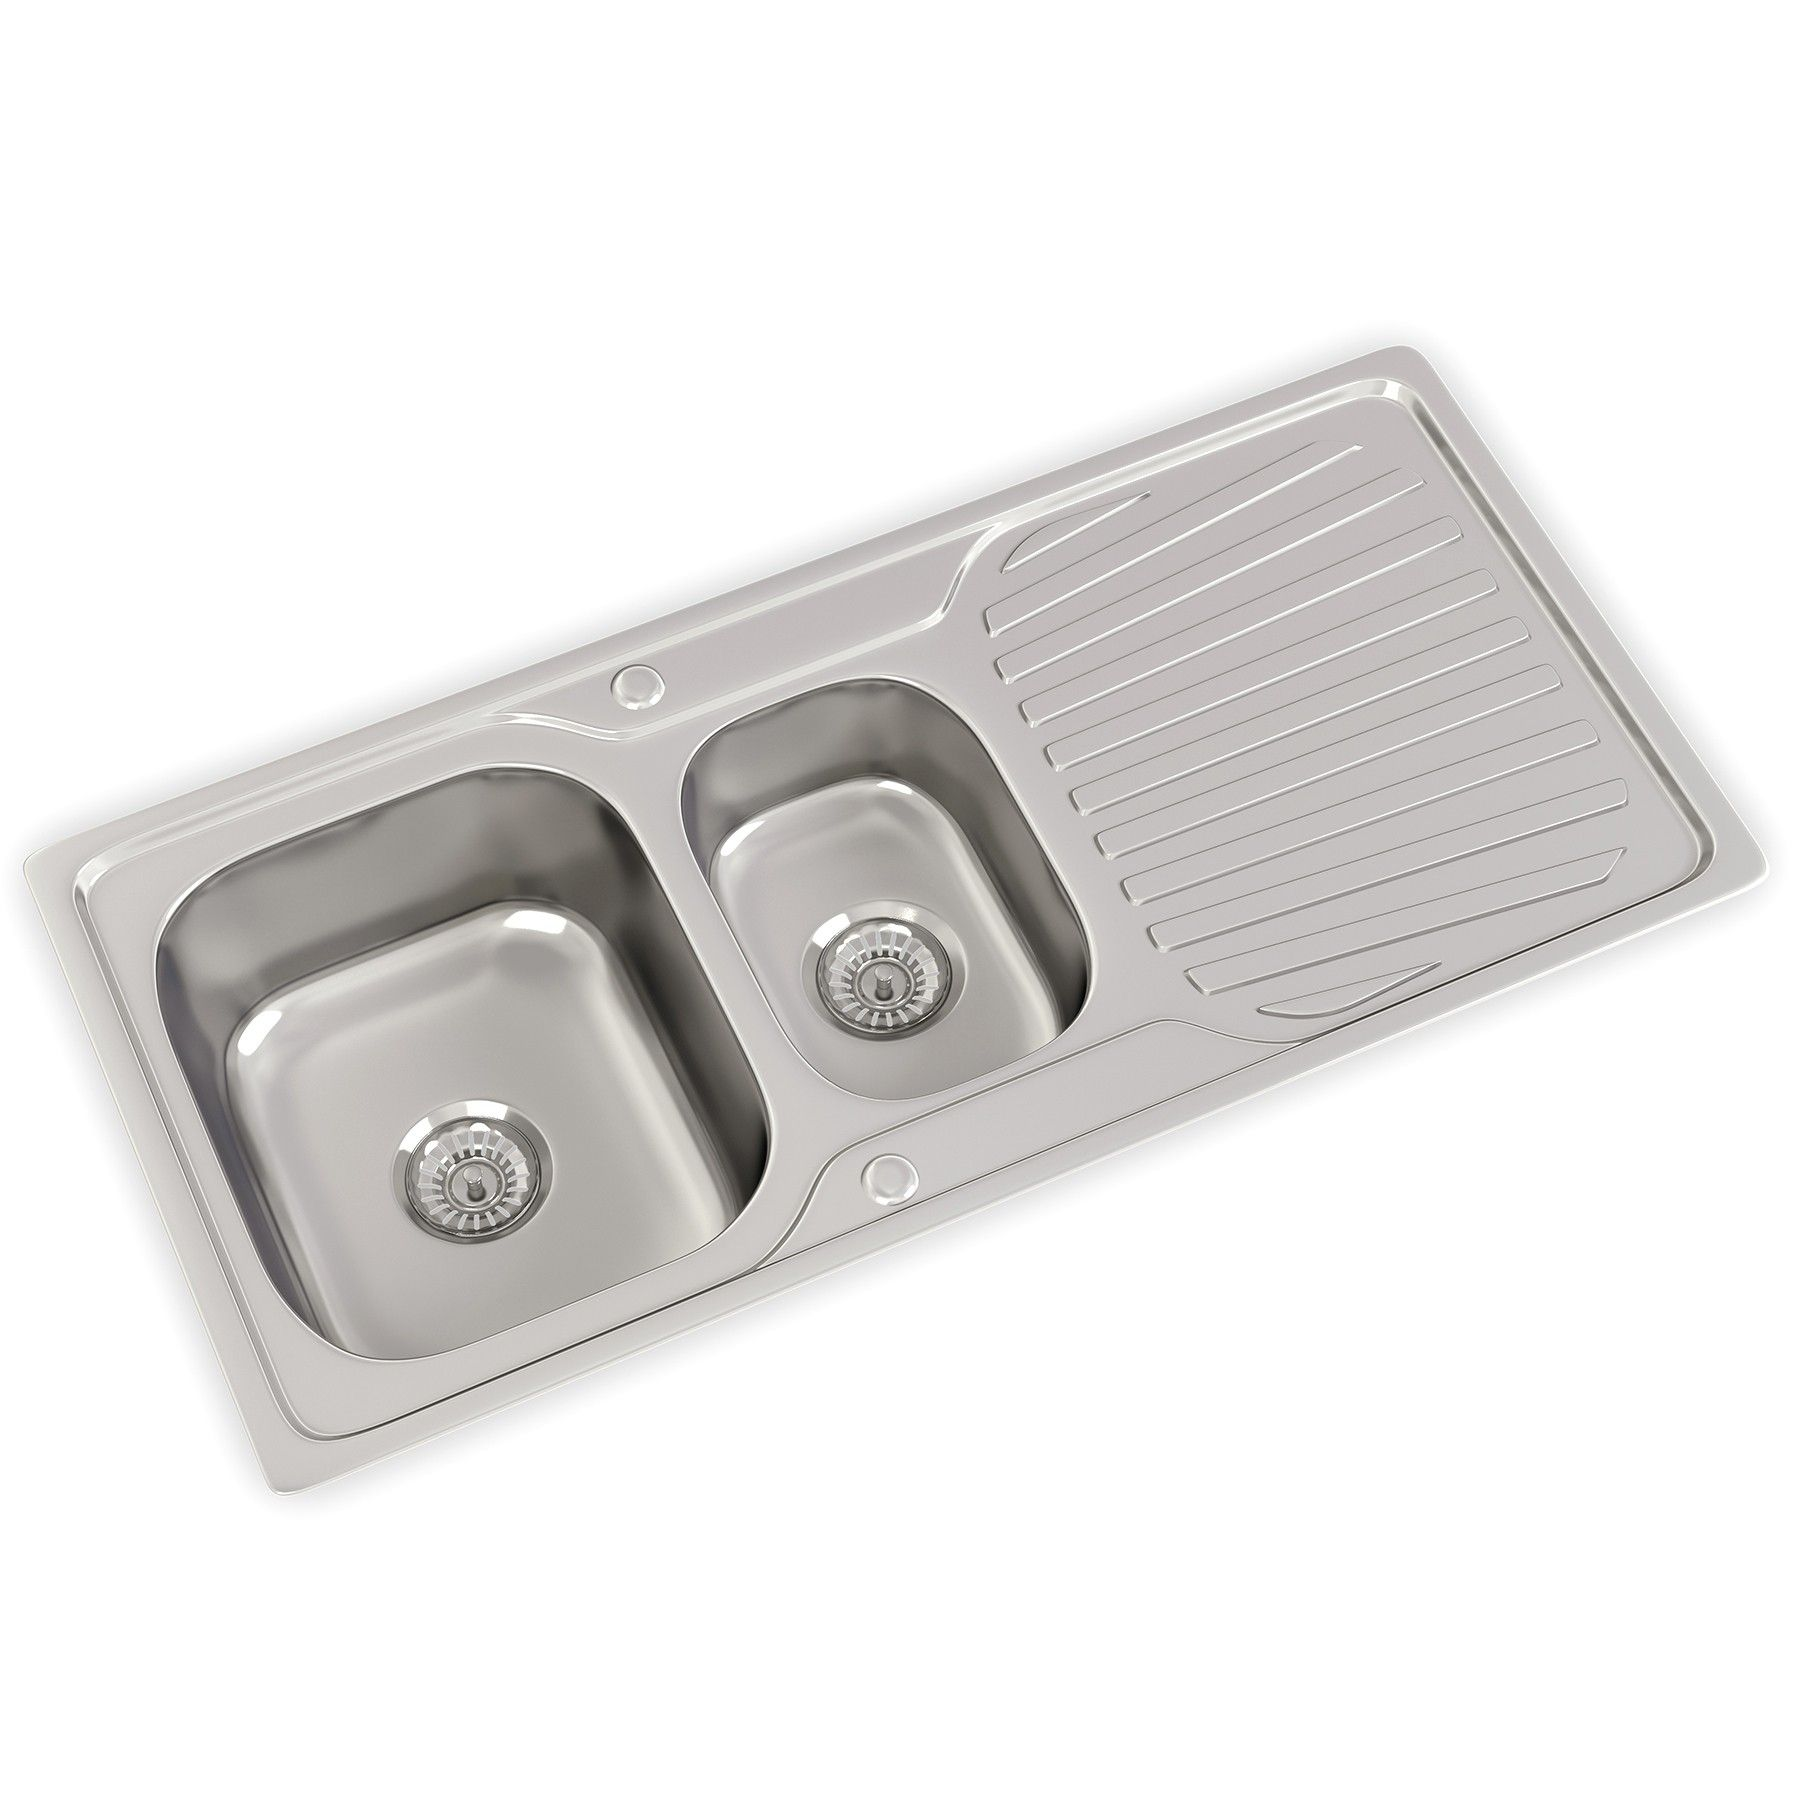 Moreton 1 5 Bowl Satin Stainless Steel Sink And Waste Kit